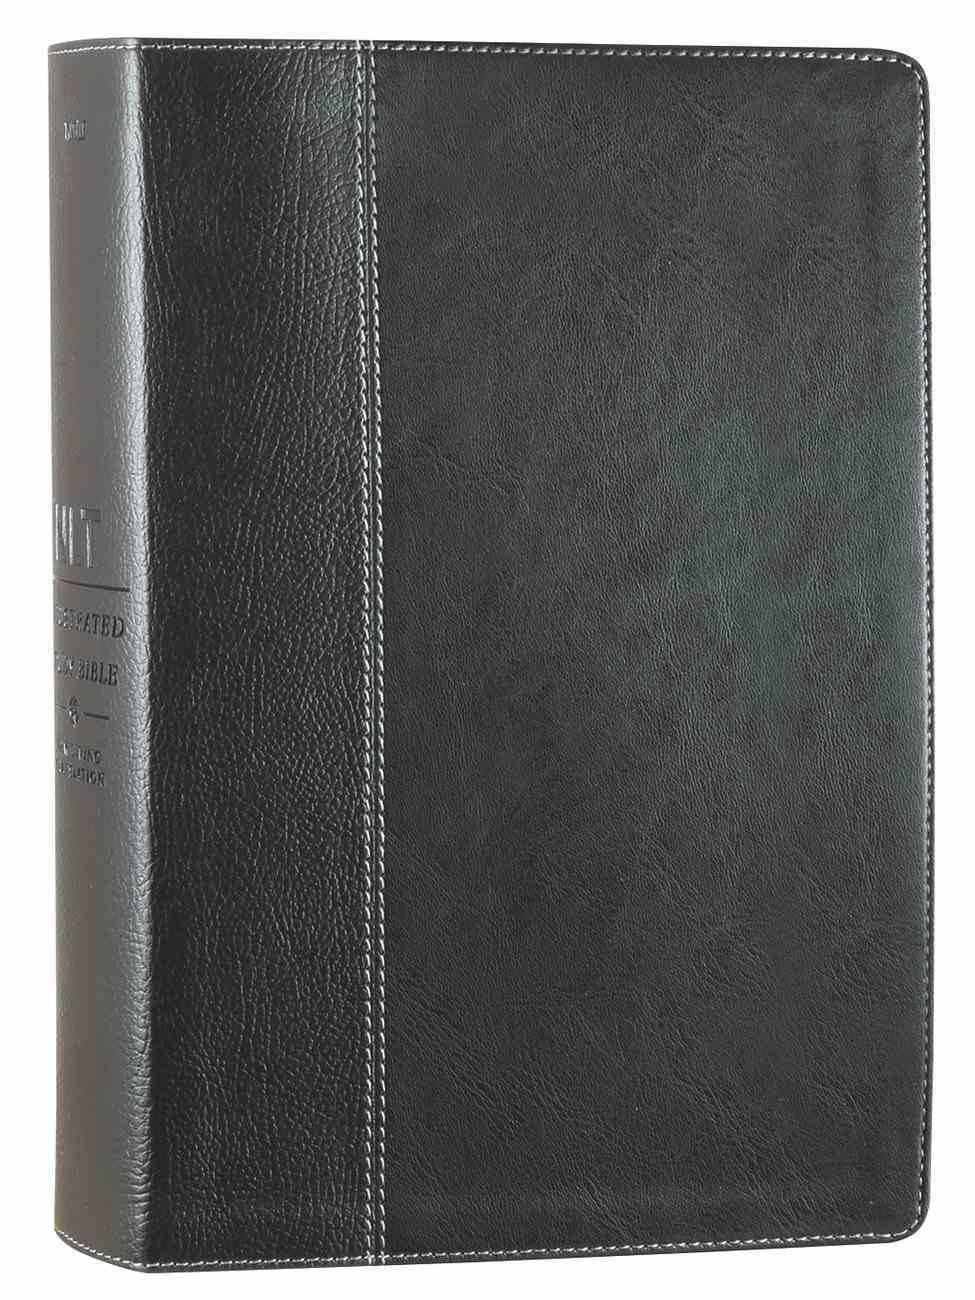 NLT Illustrated Study Bible Black/Onyx (Black Letter Edition) Imitation Leather